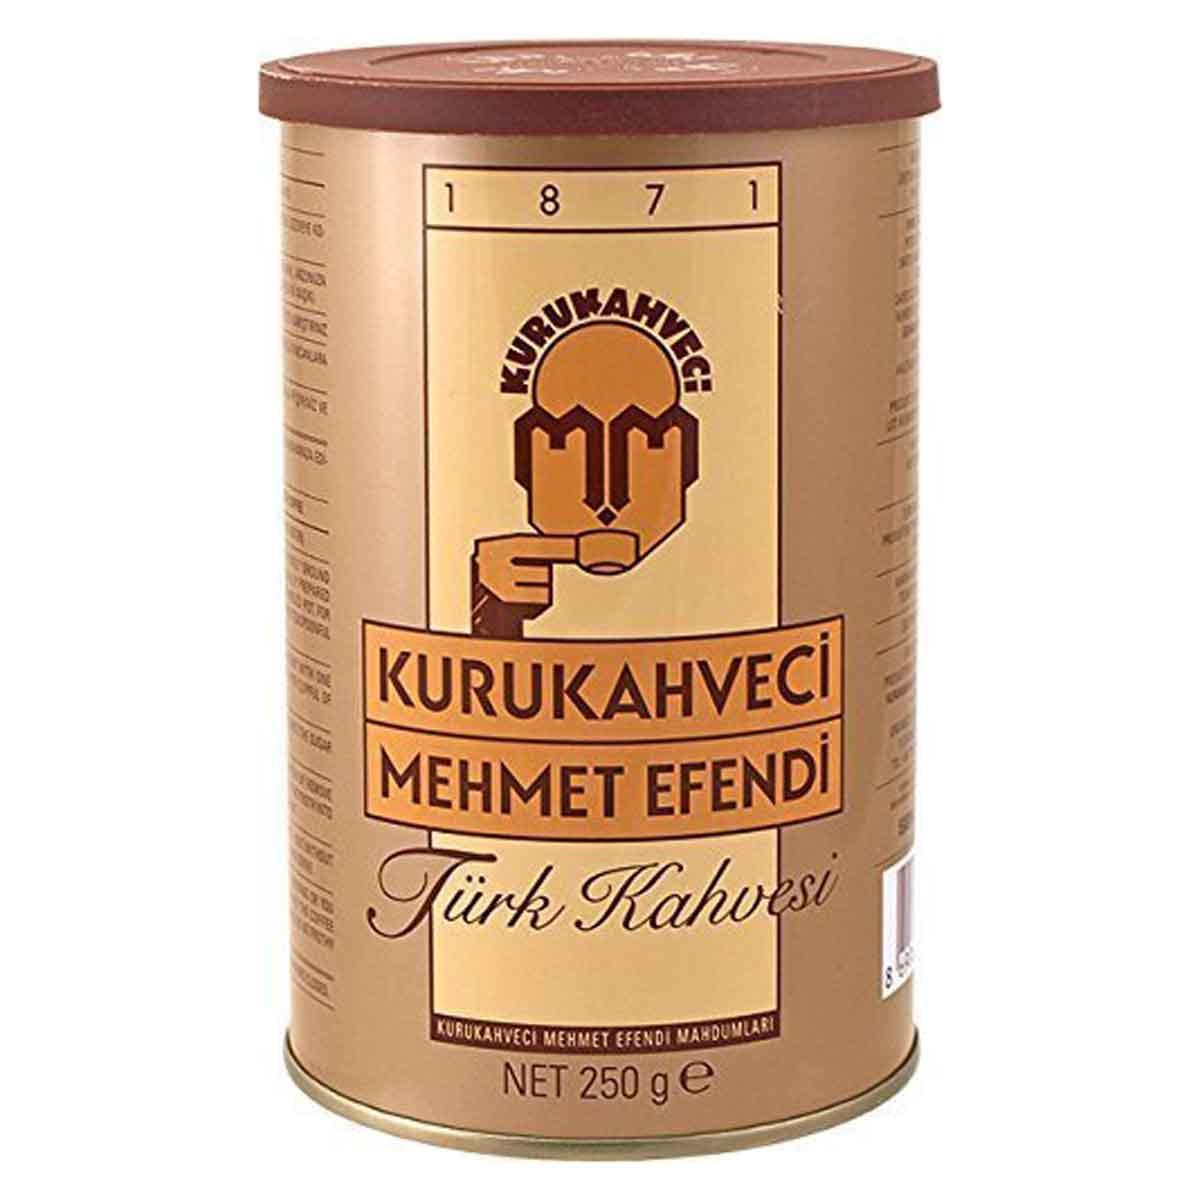 Kurukahveci Mehmet Efendi - Türkischer Kaffee